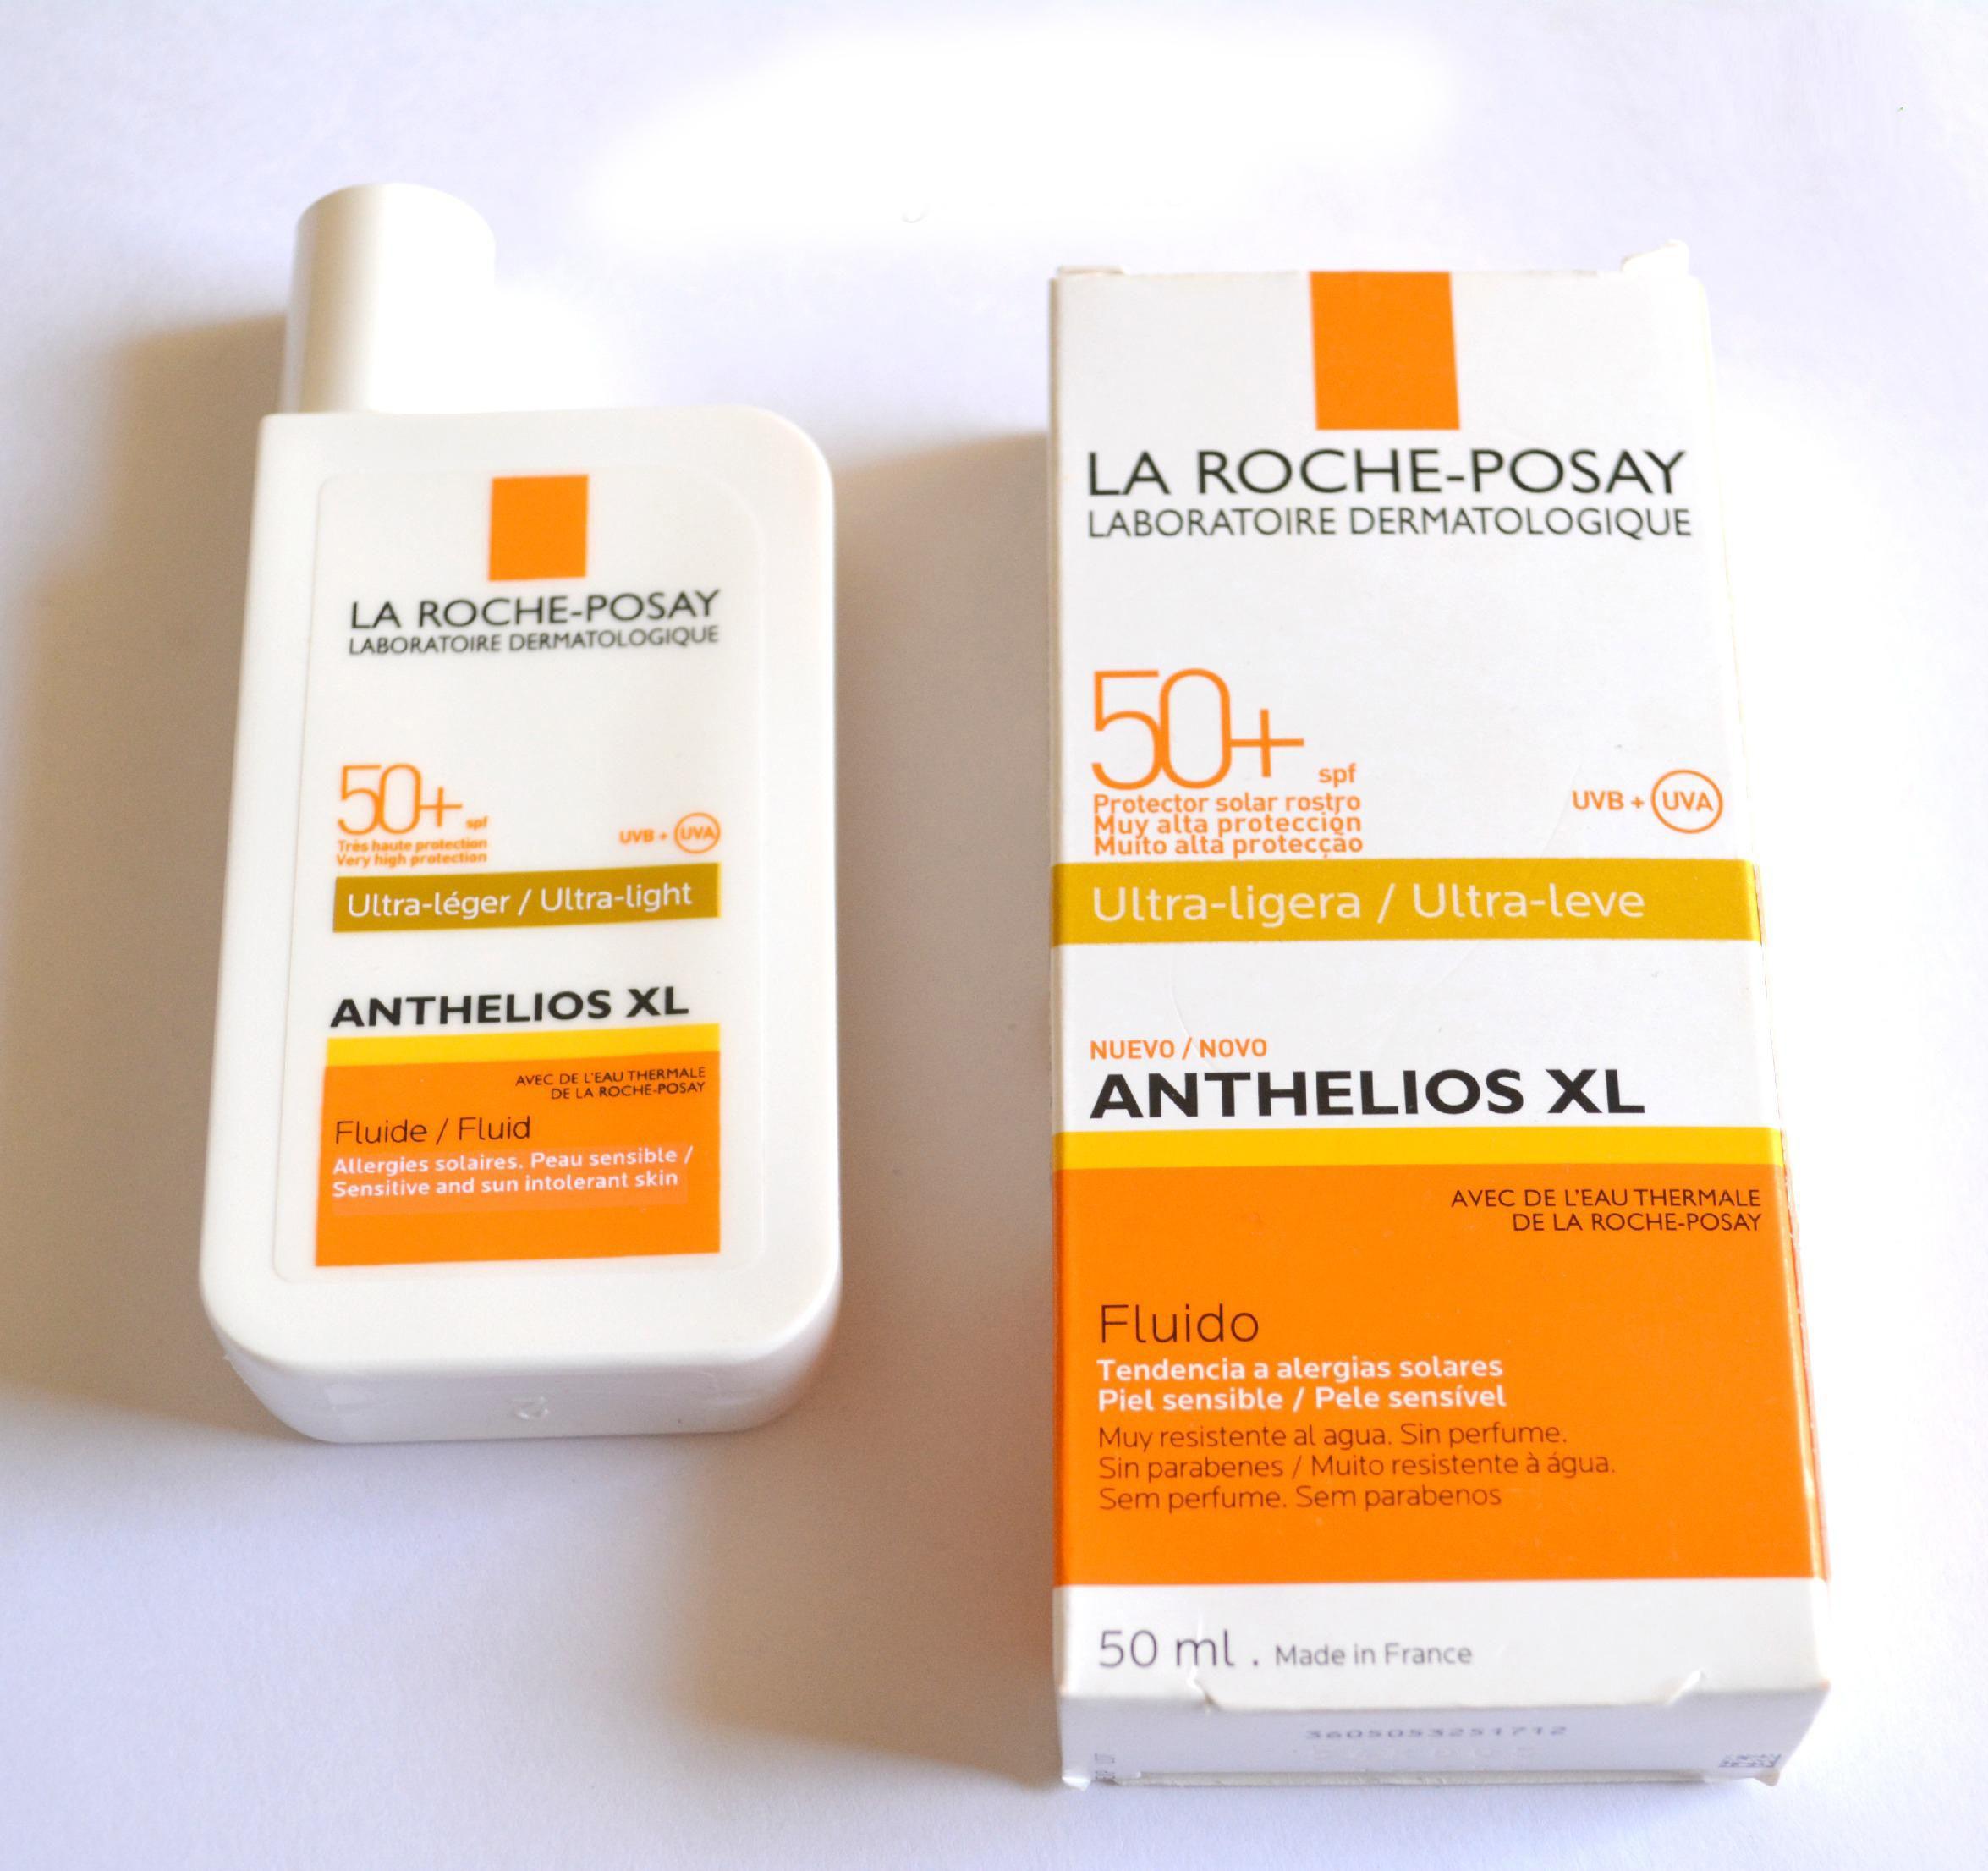 Kem chống nắng La Roche Posay Anthelios XL Fluid Ultra-Light SPF 50